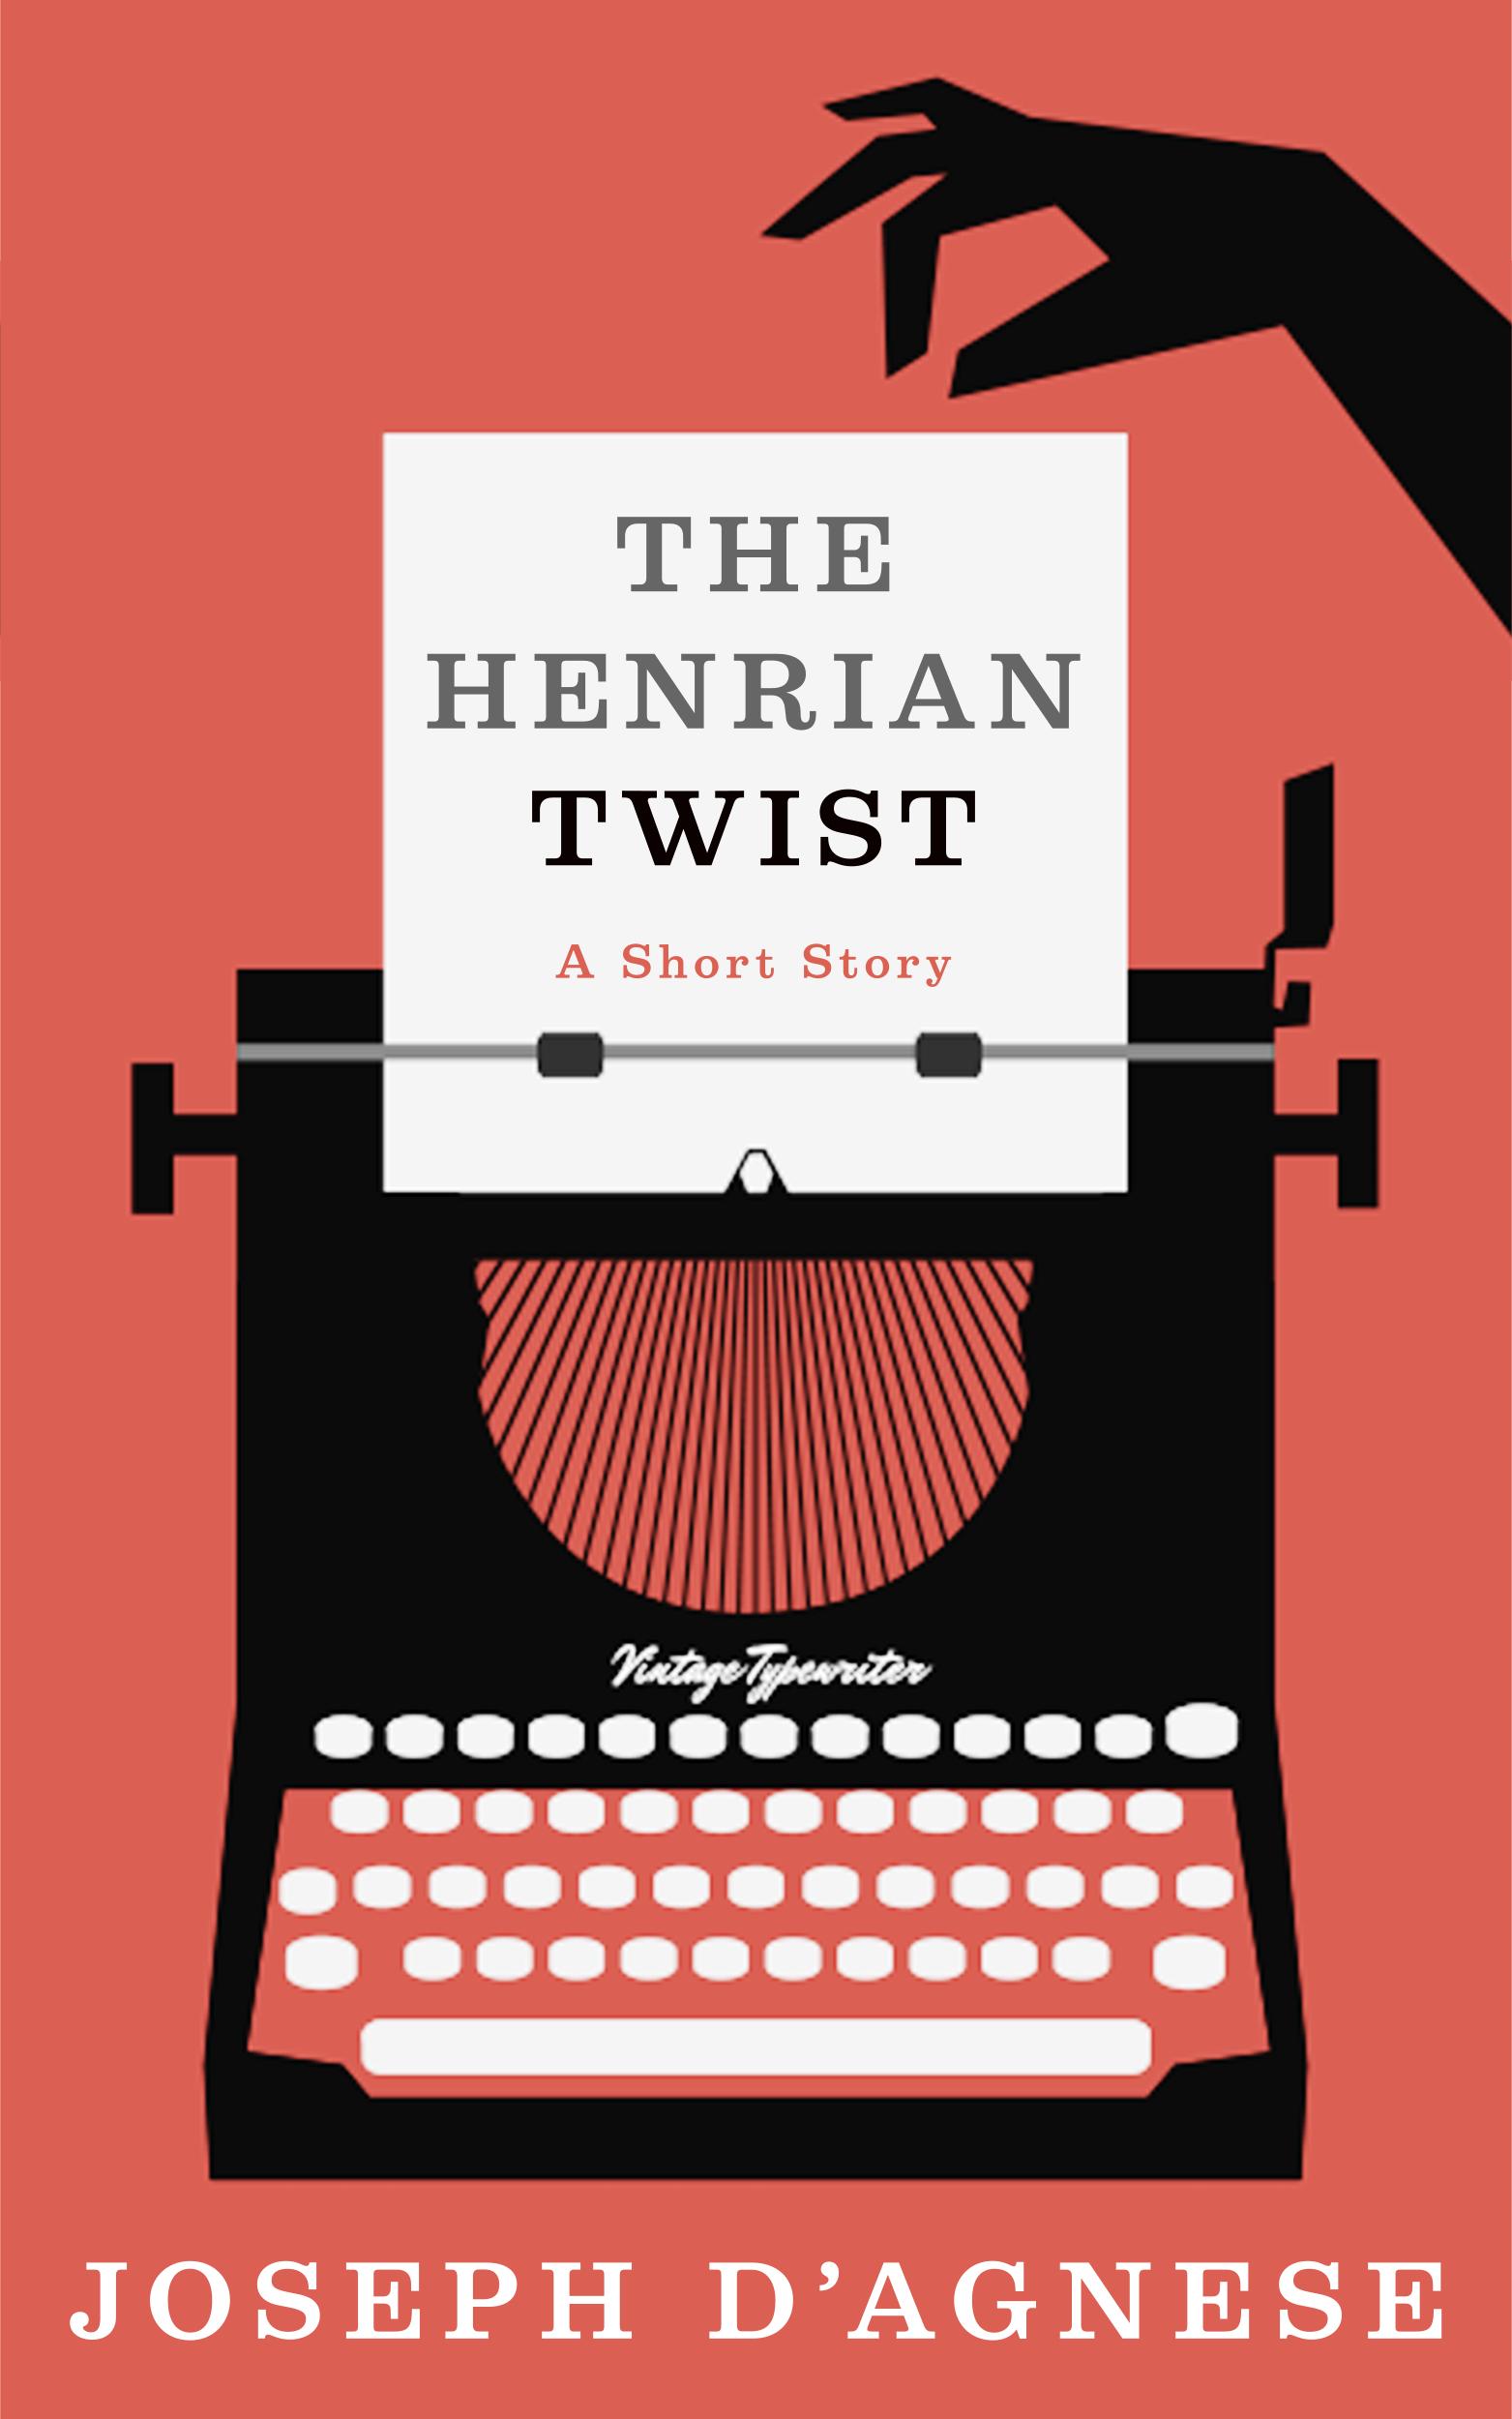 The Henrian Twist by Joseph D'Agnese